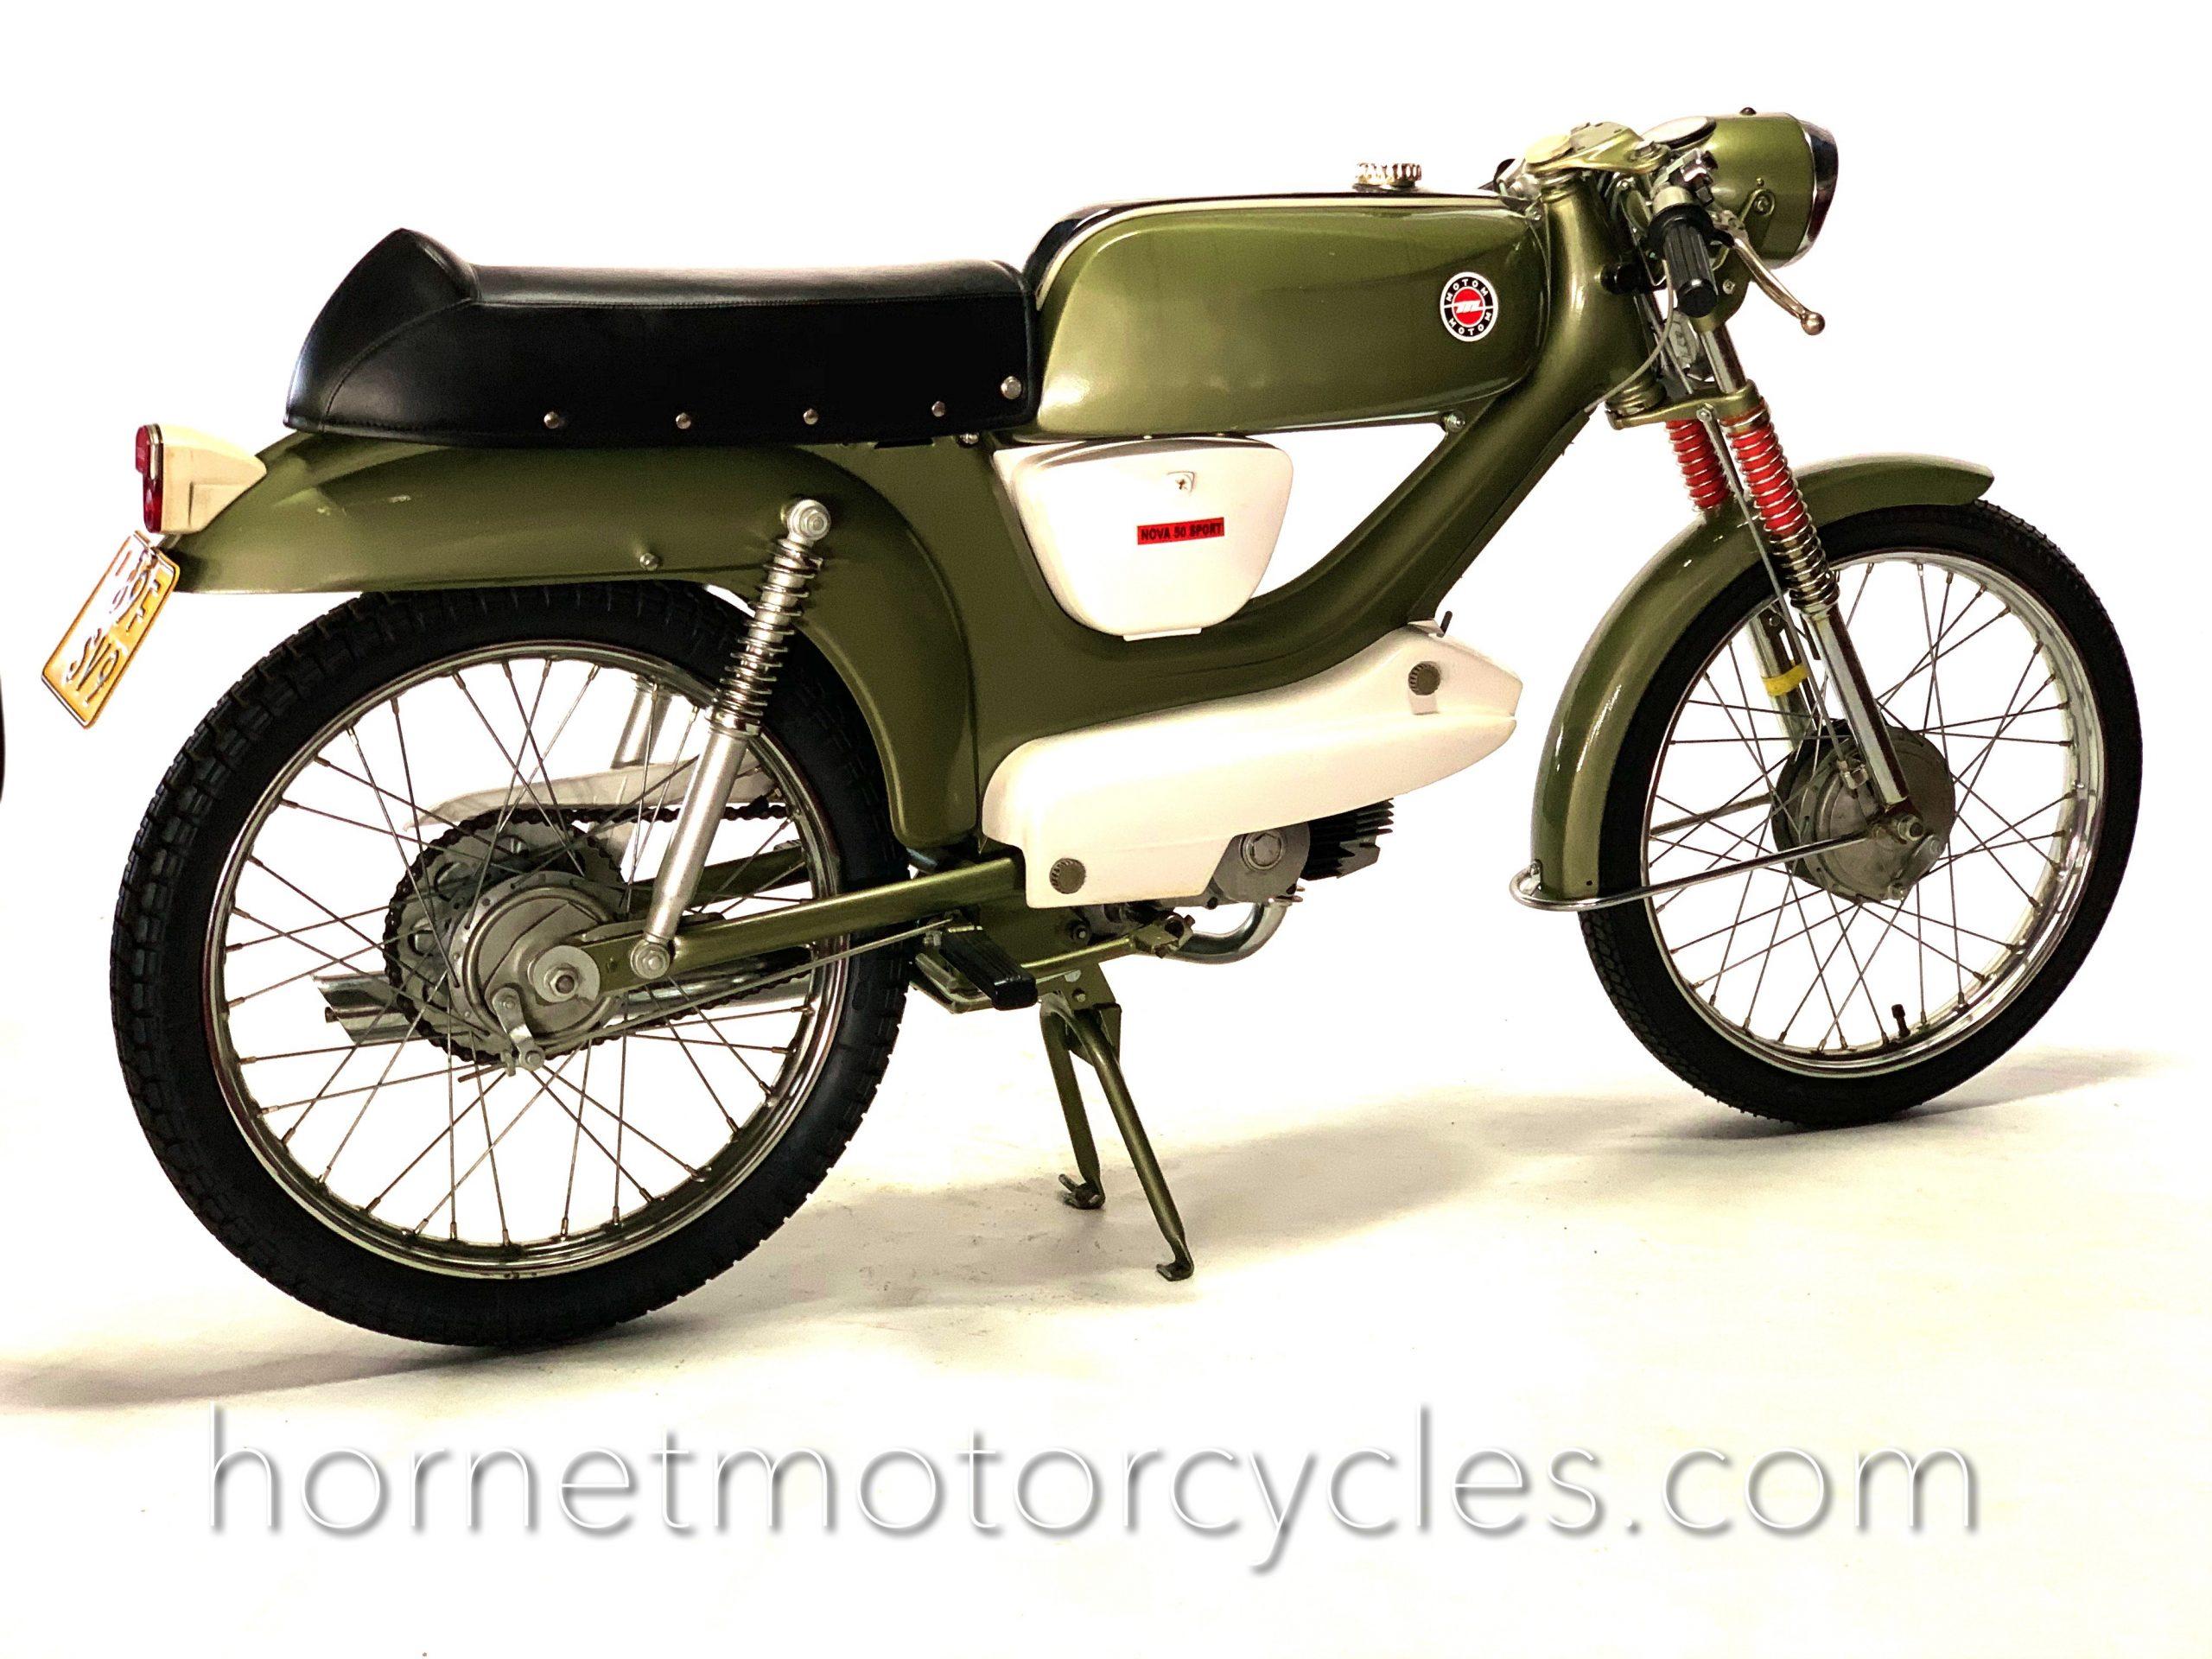 Motom Nova 50 Sport